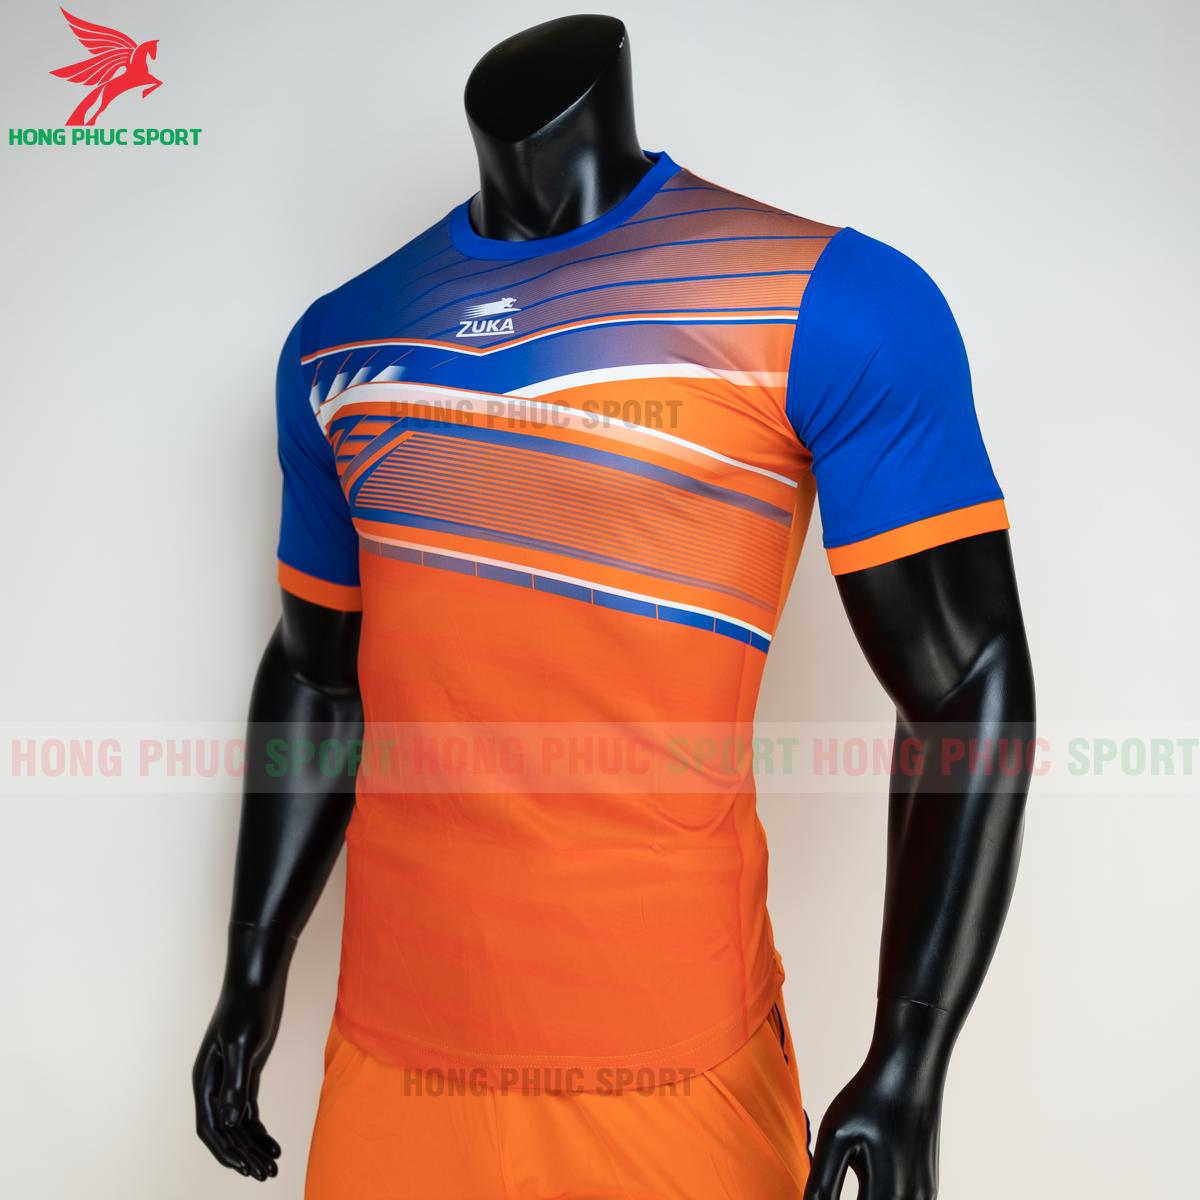 https://cdn.hongphucsport.com/unsafe/s4.shopbay.vn/files/285/ao-bong-da-khong-logo-zuka-01-mau-cam-3-60502bbf6a5ce.png